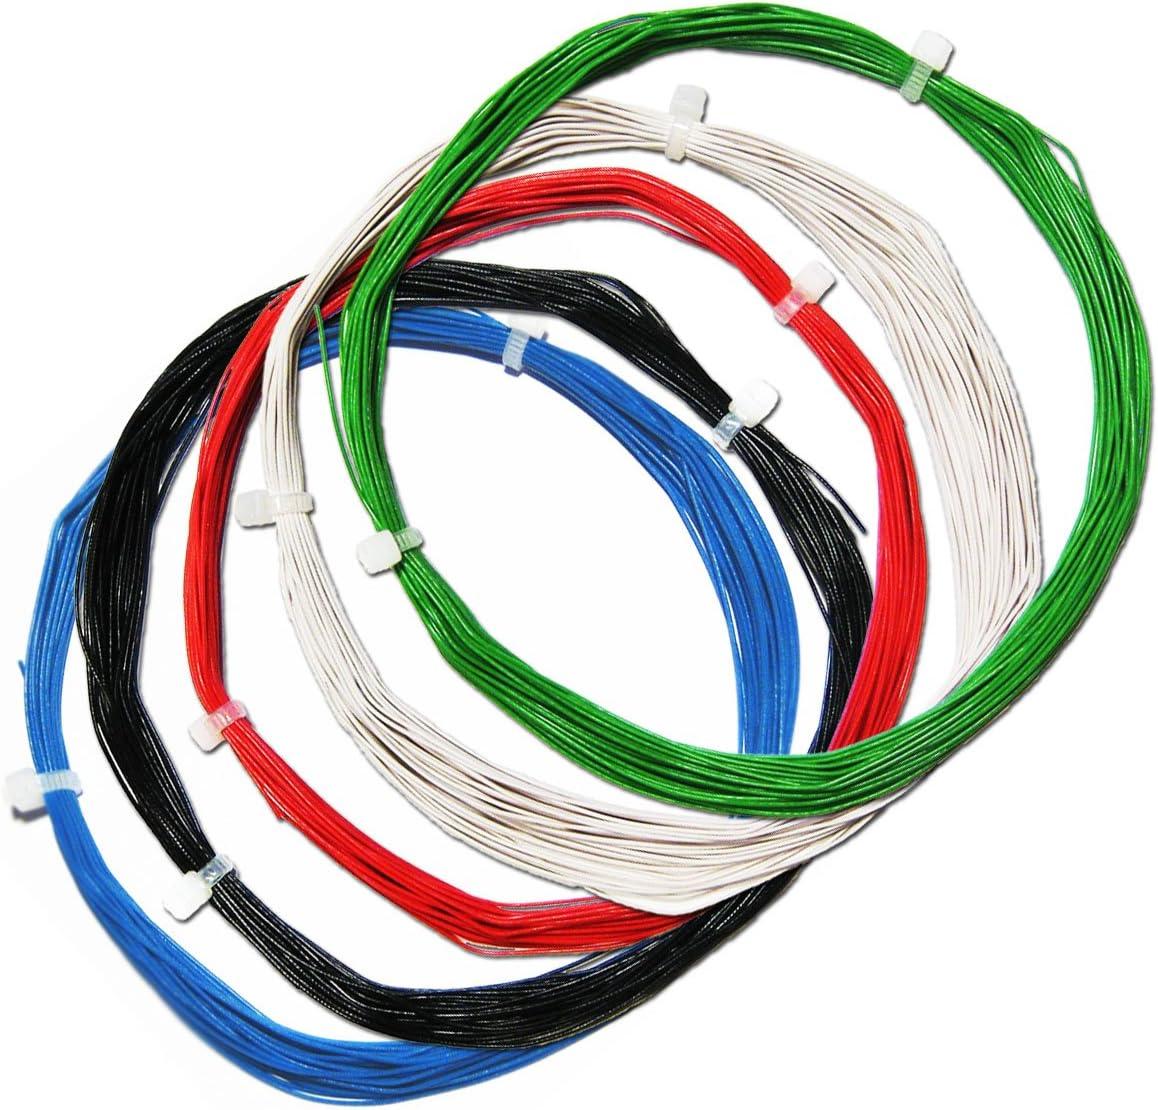 0,19€//m 10m Litze grün KABEL flexibel 0,25mm² zB LEDs